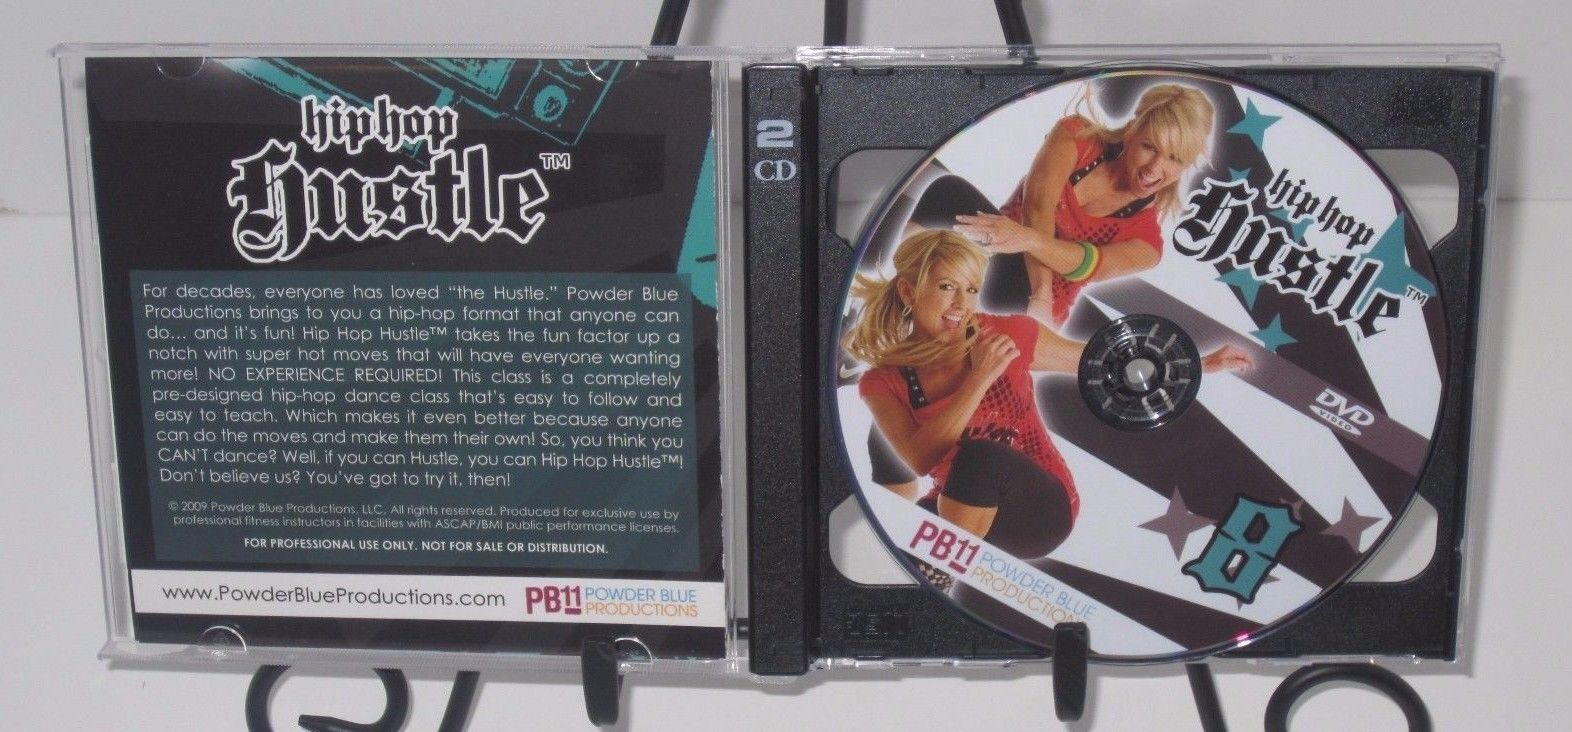 HIP HOP HUSTLE Vol. 8 Workout DVD - Chalene Johnson - Powder Blue Productions!